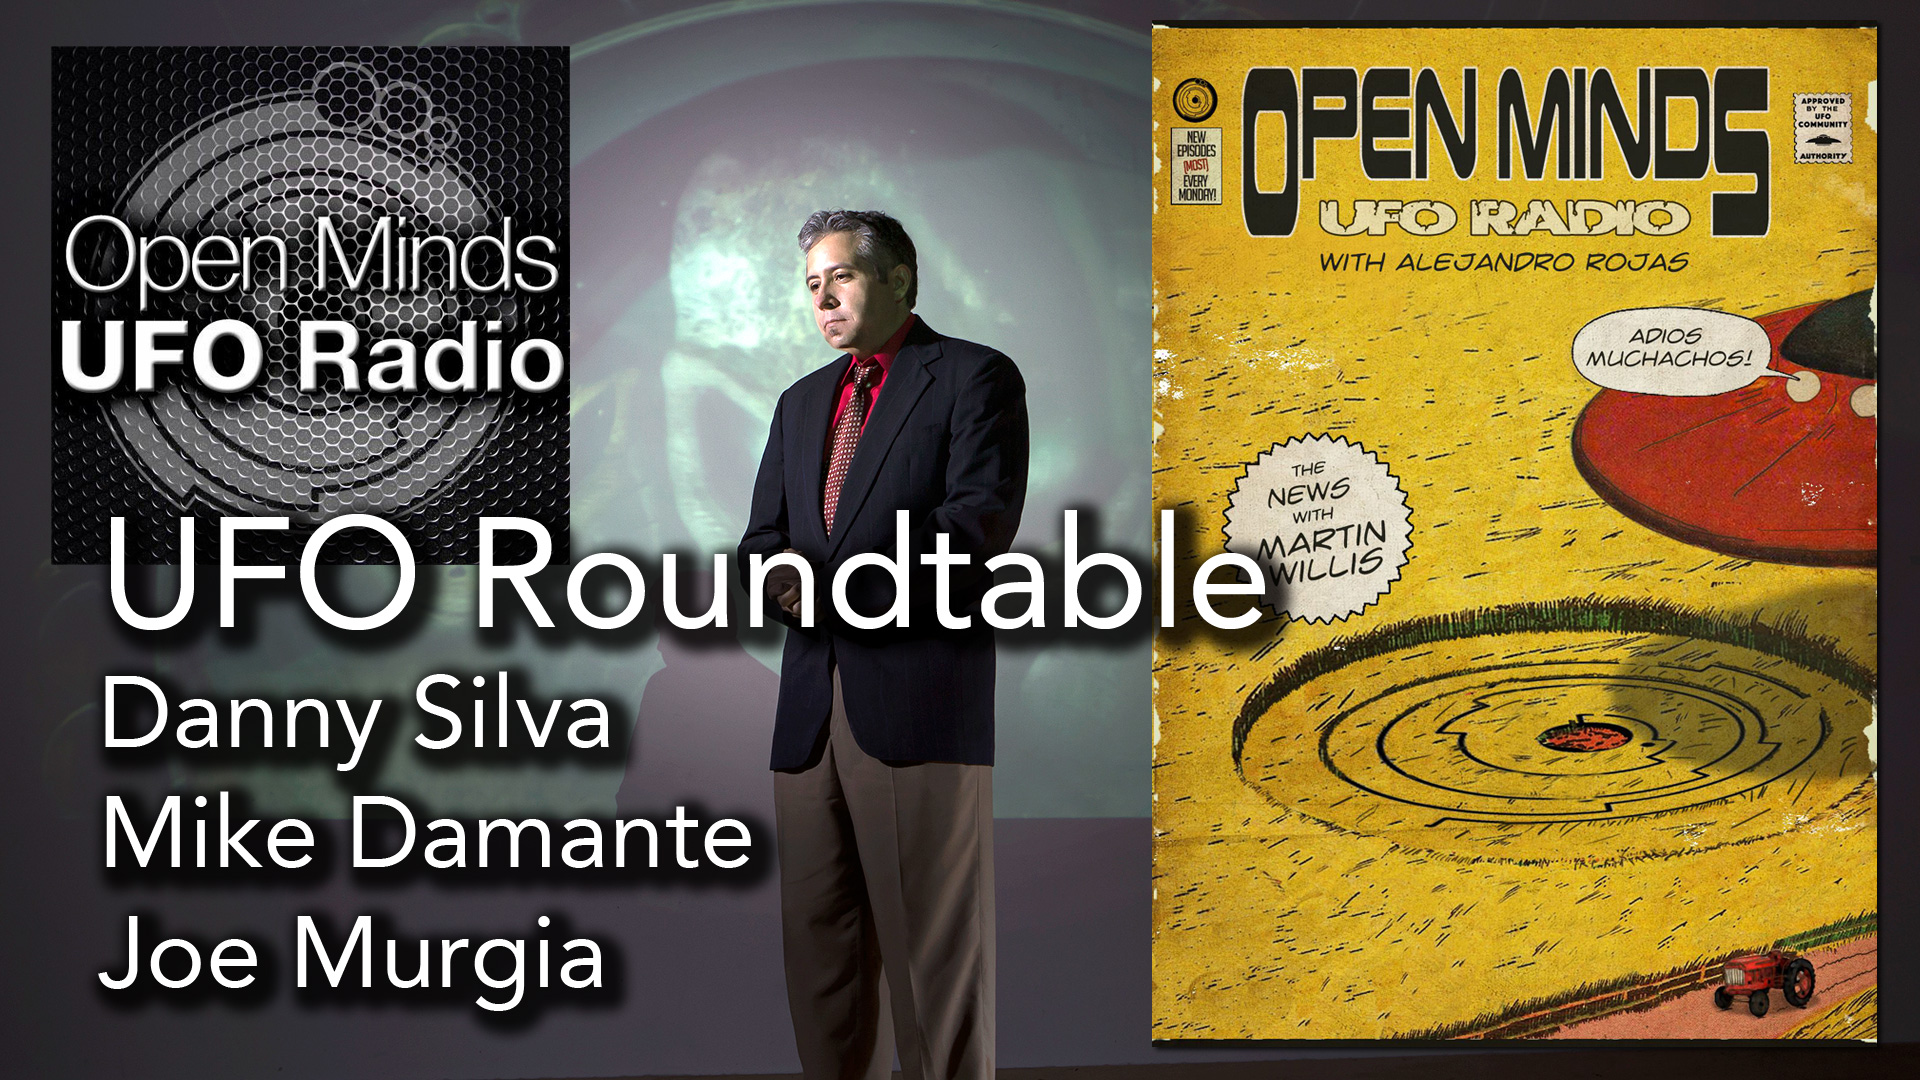 UFO Roundtable on Unidentified and Recent UFO Revelations on Open Minds UFO Radio